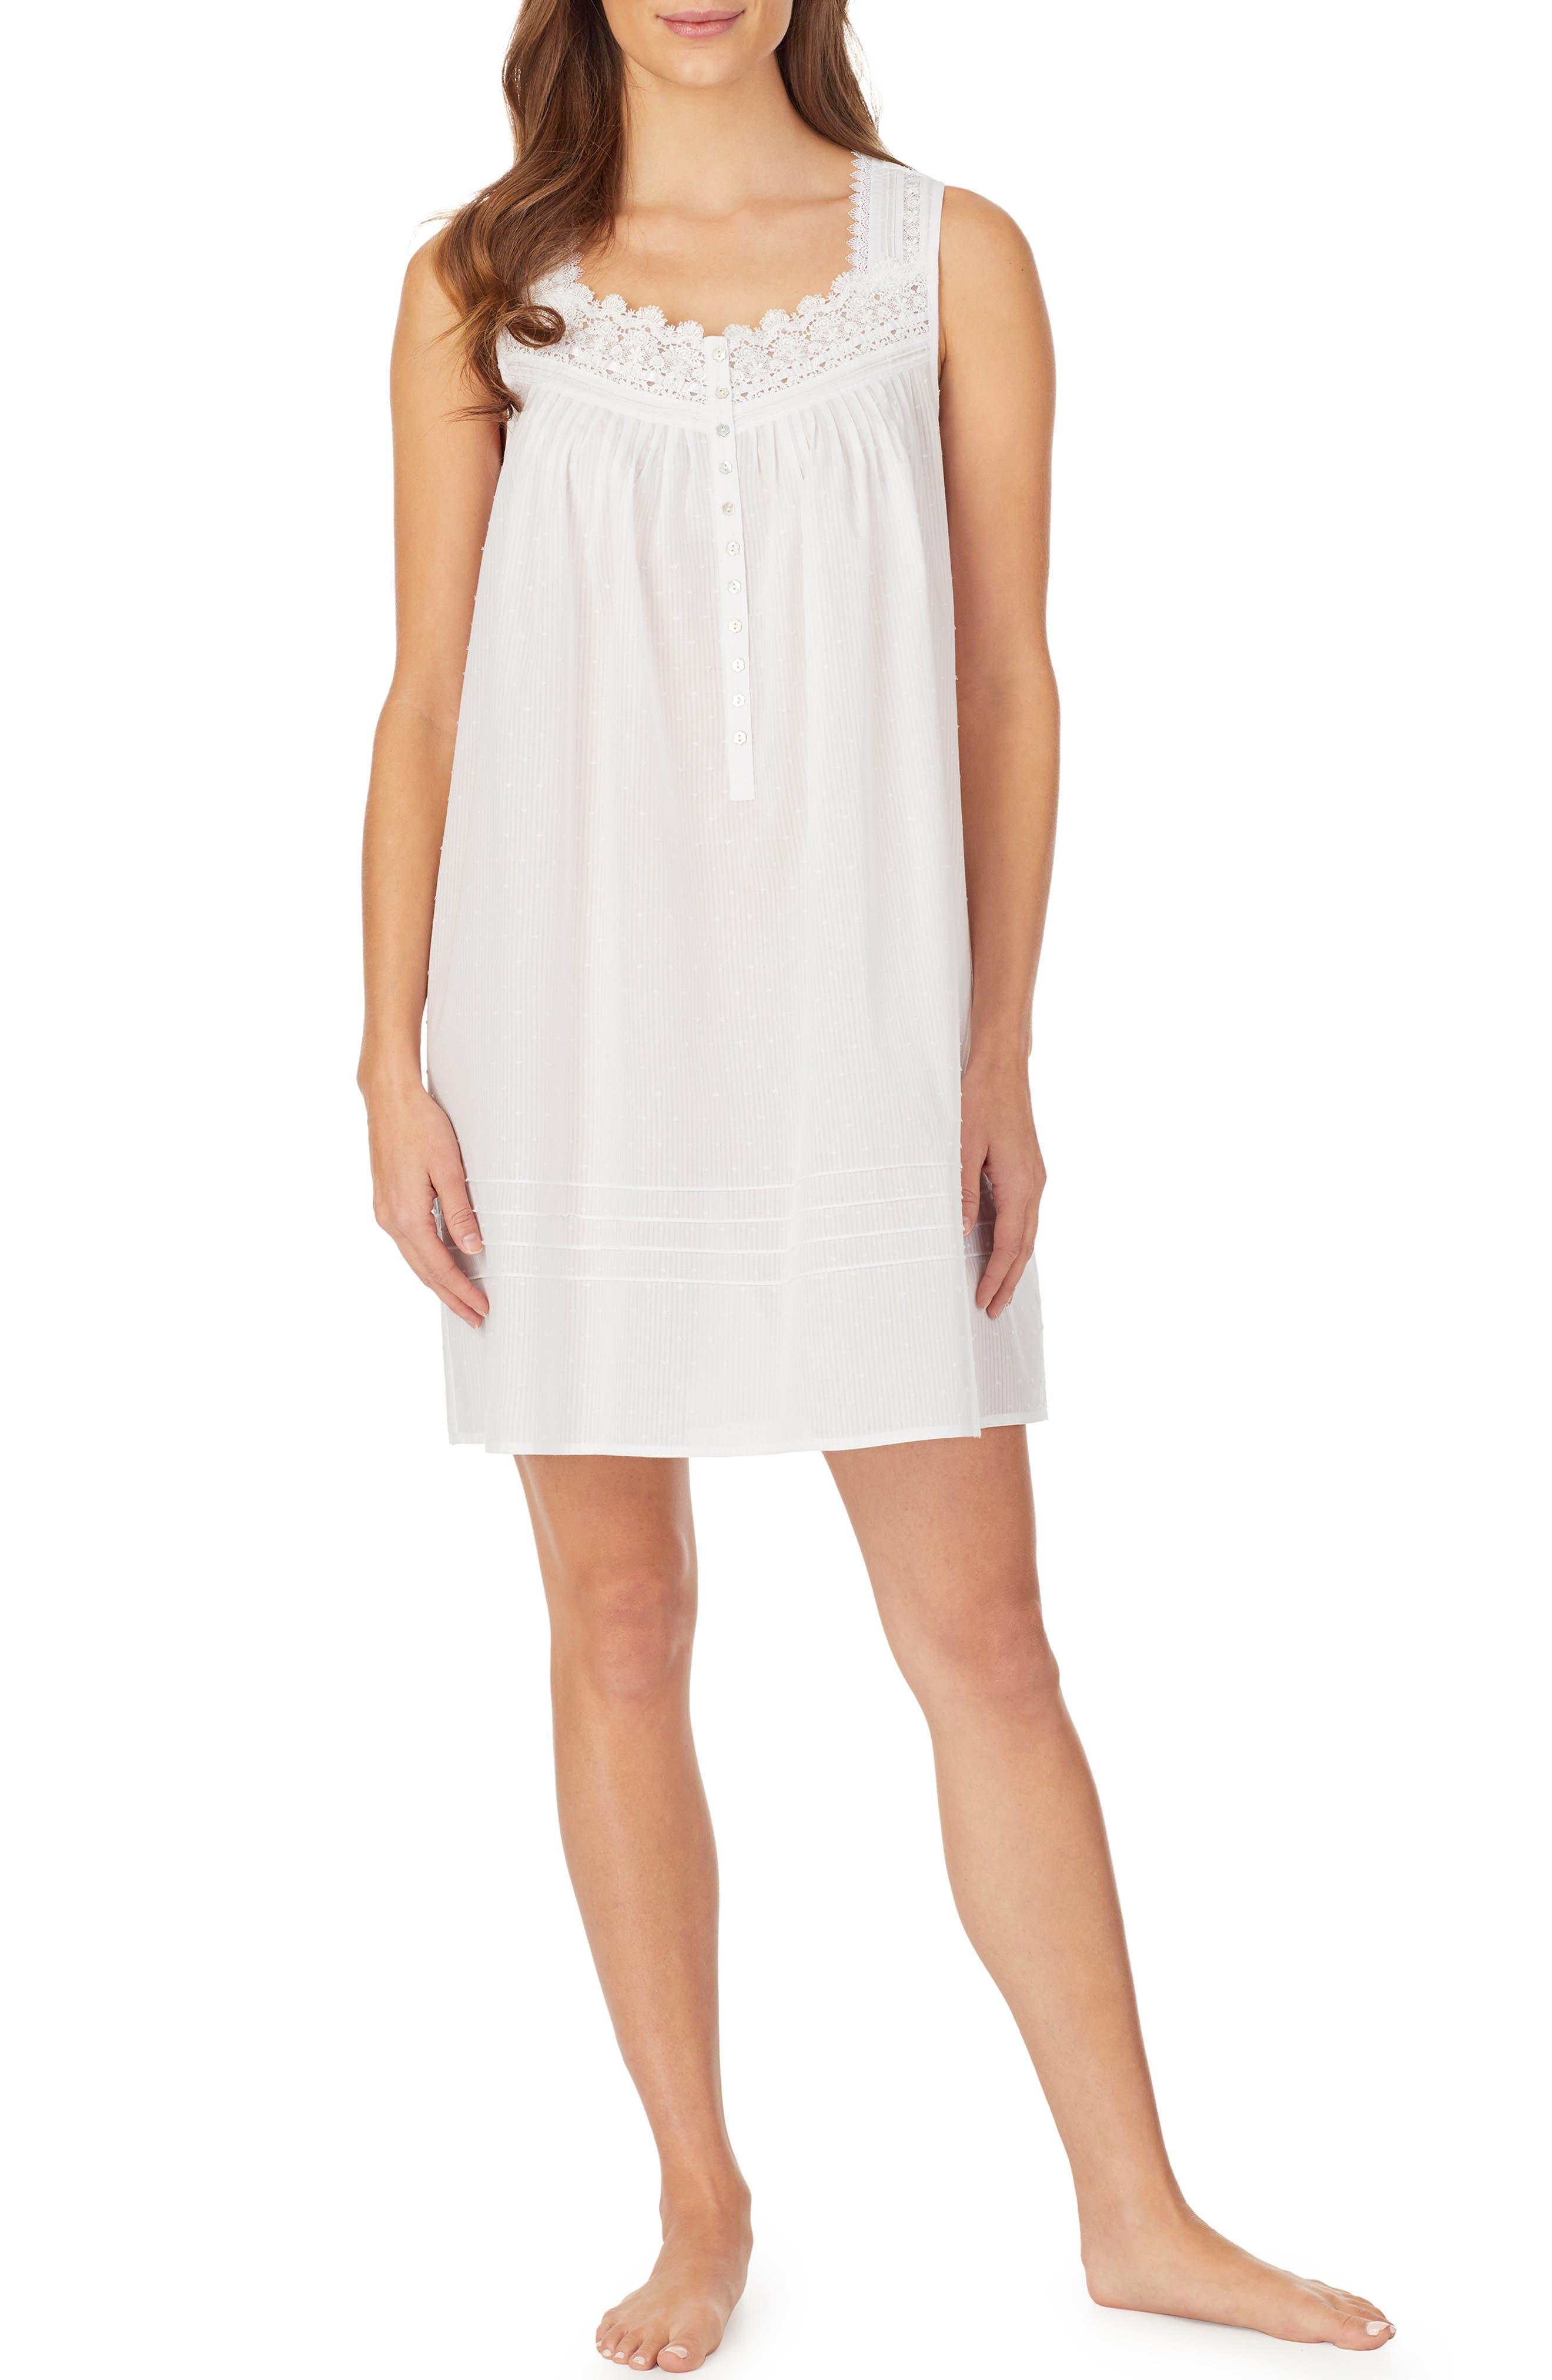 Eileen West Clip Dot Short Nightgown, White